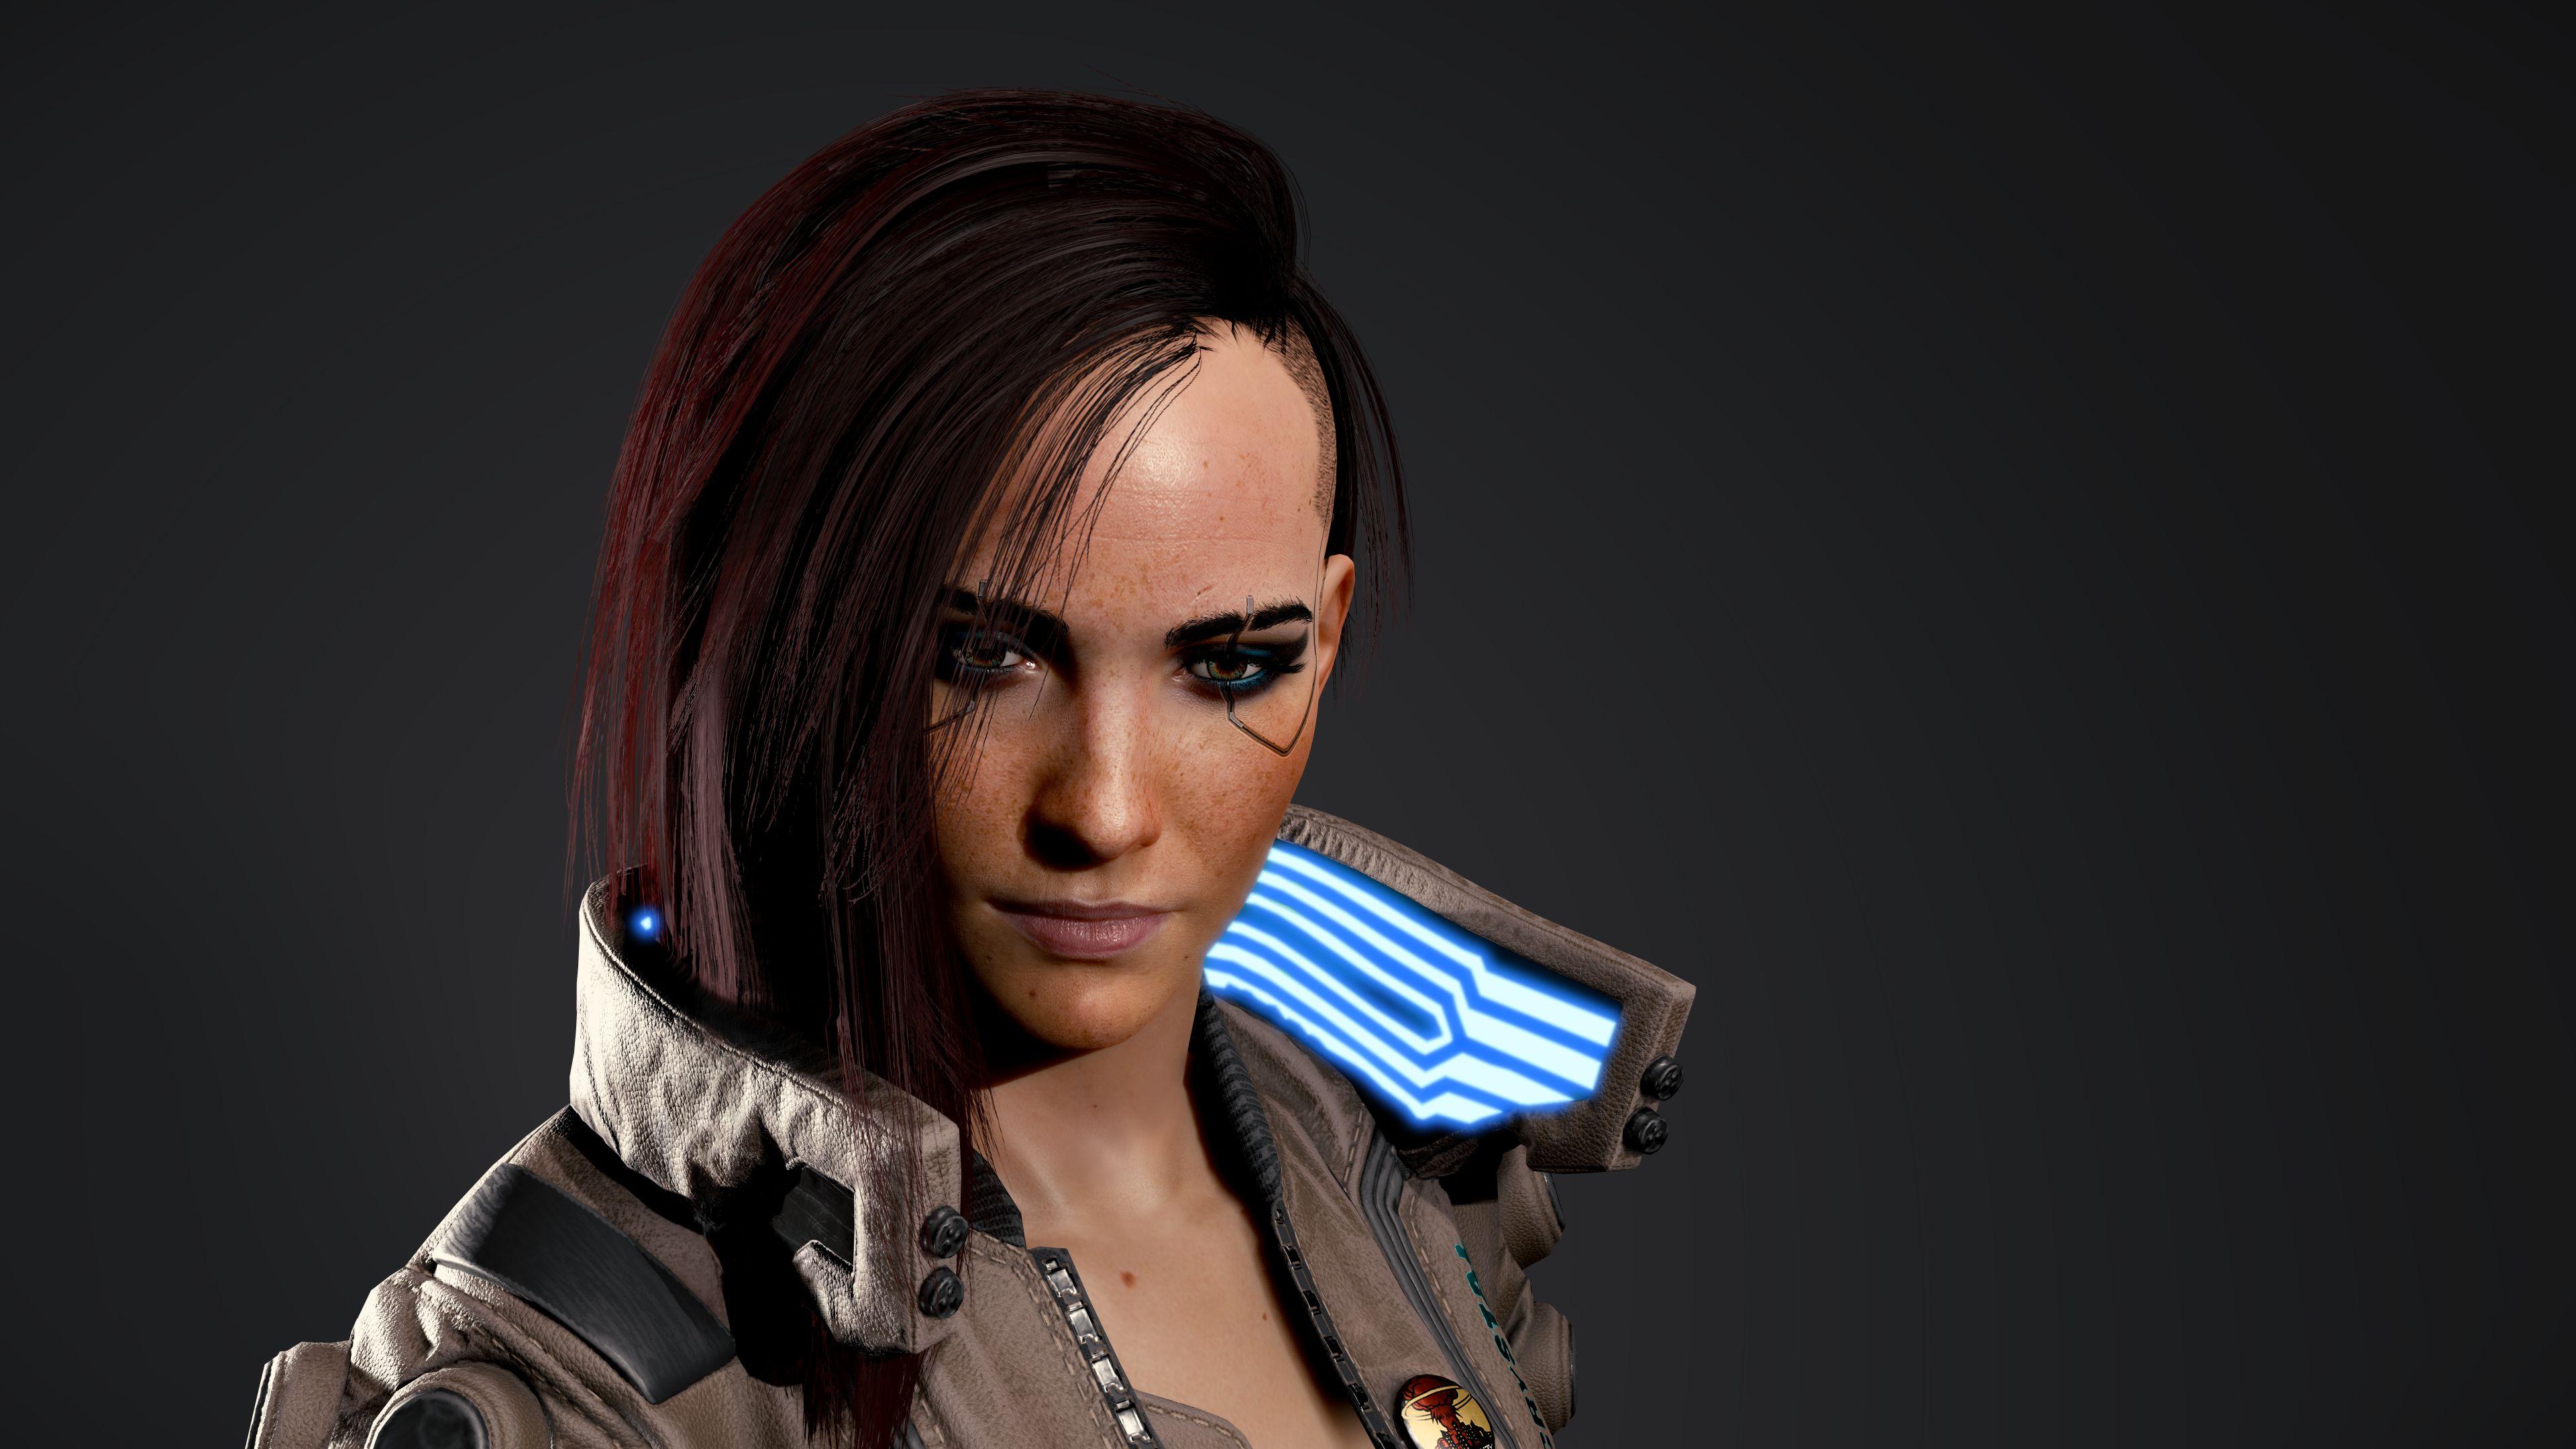 cyberpunk 2077 character 2019 1565054411 - Cyberpunk 2077 Character 2019 - xbox games wallpapers, ps games wallpapers, pc games wallpapers, hd-wallpapers, games wallpapers, cyberpunk 2077 wallpapers, 4k-wallpapers